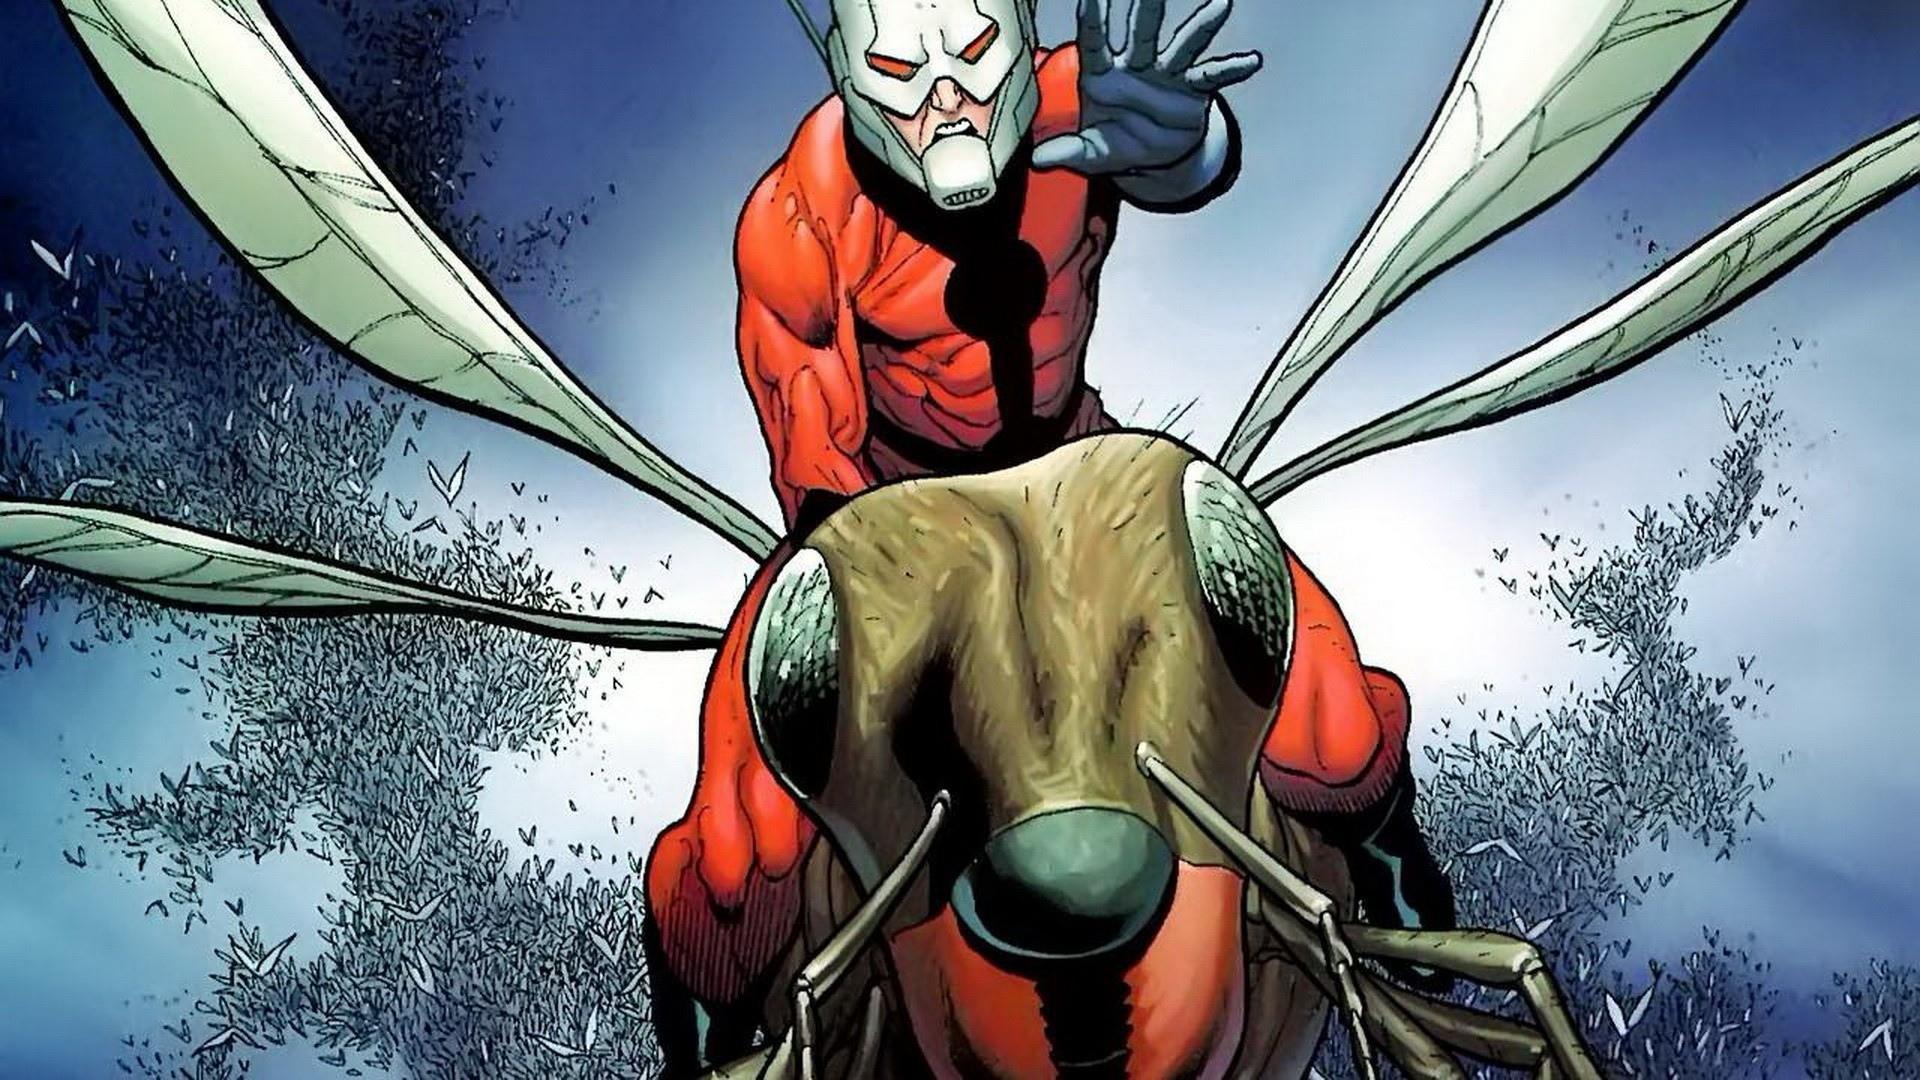 Ant-Man Comics wallpapers HD quality